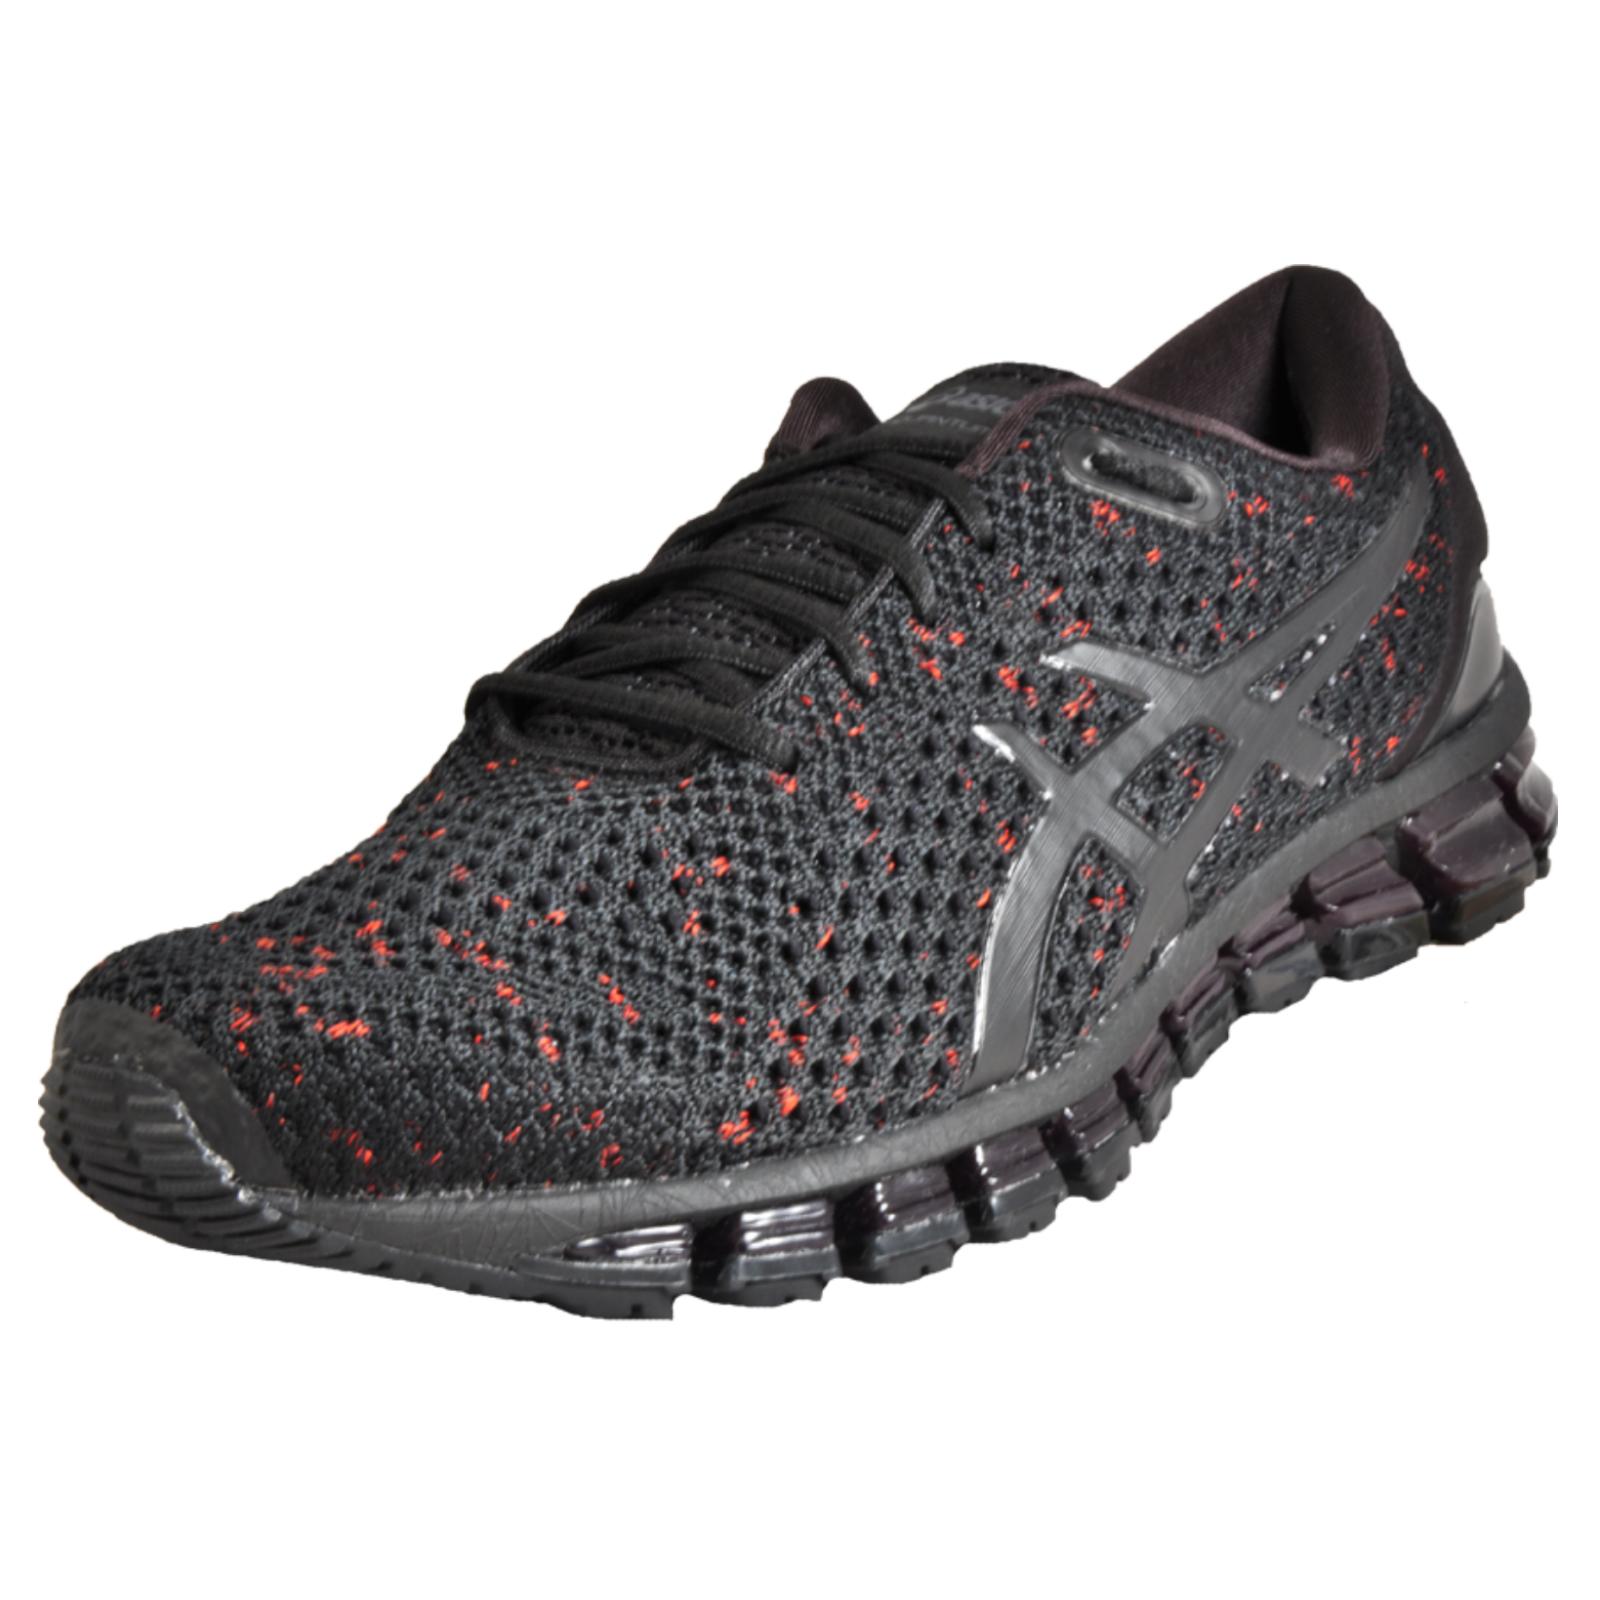 ... Asics Gel Quantum 360 Knit 2 Men s Premium Running Shoes Gym Trainers  Black fe40f18d32cf9cd ... 9cb731fb465ef